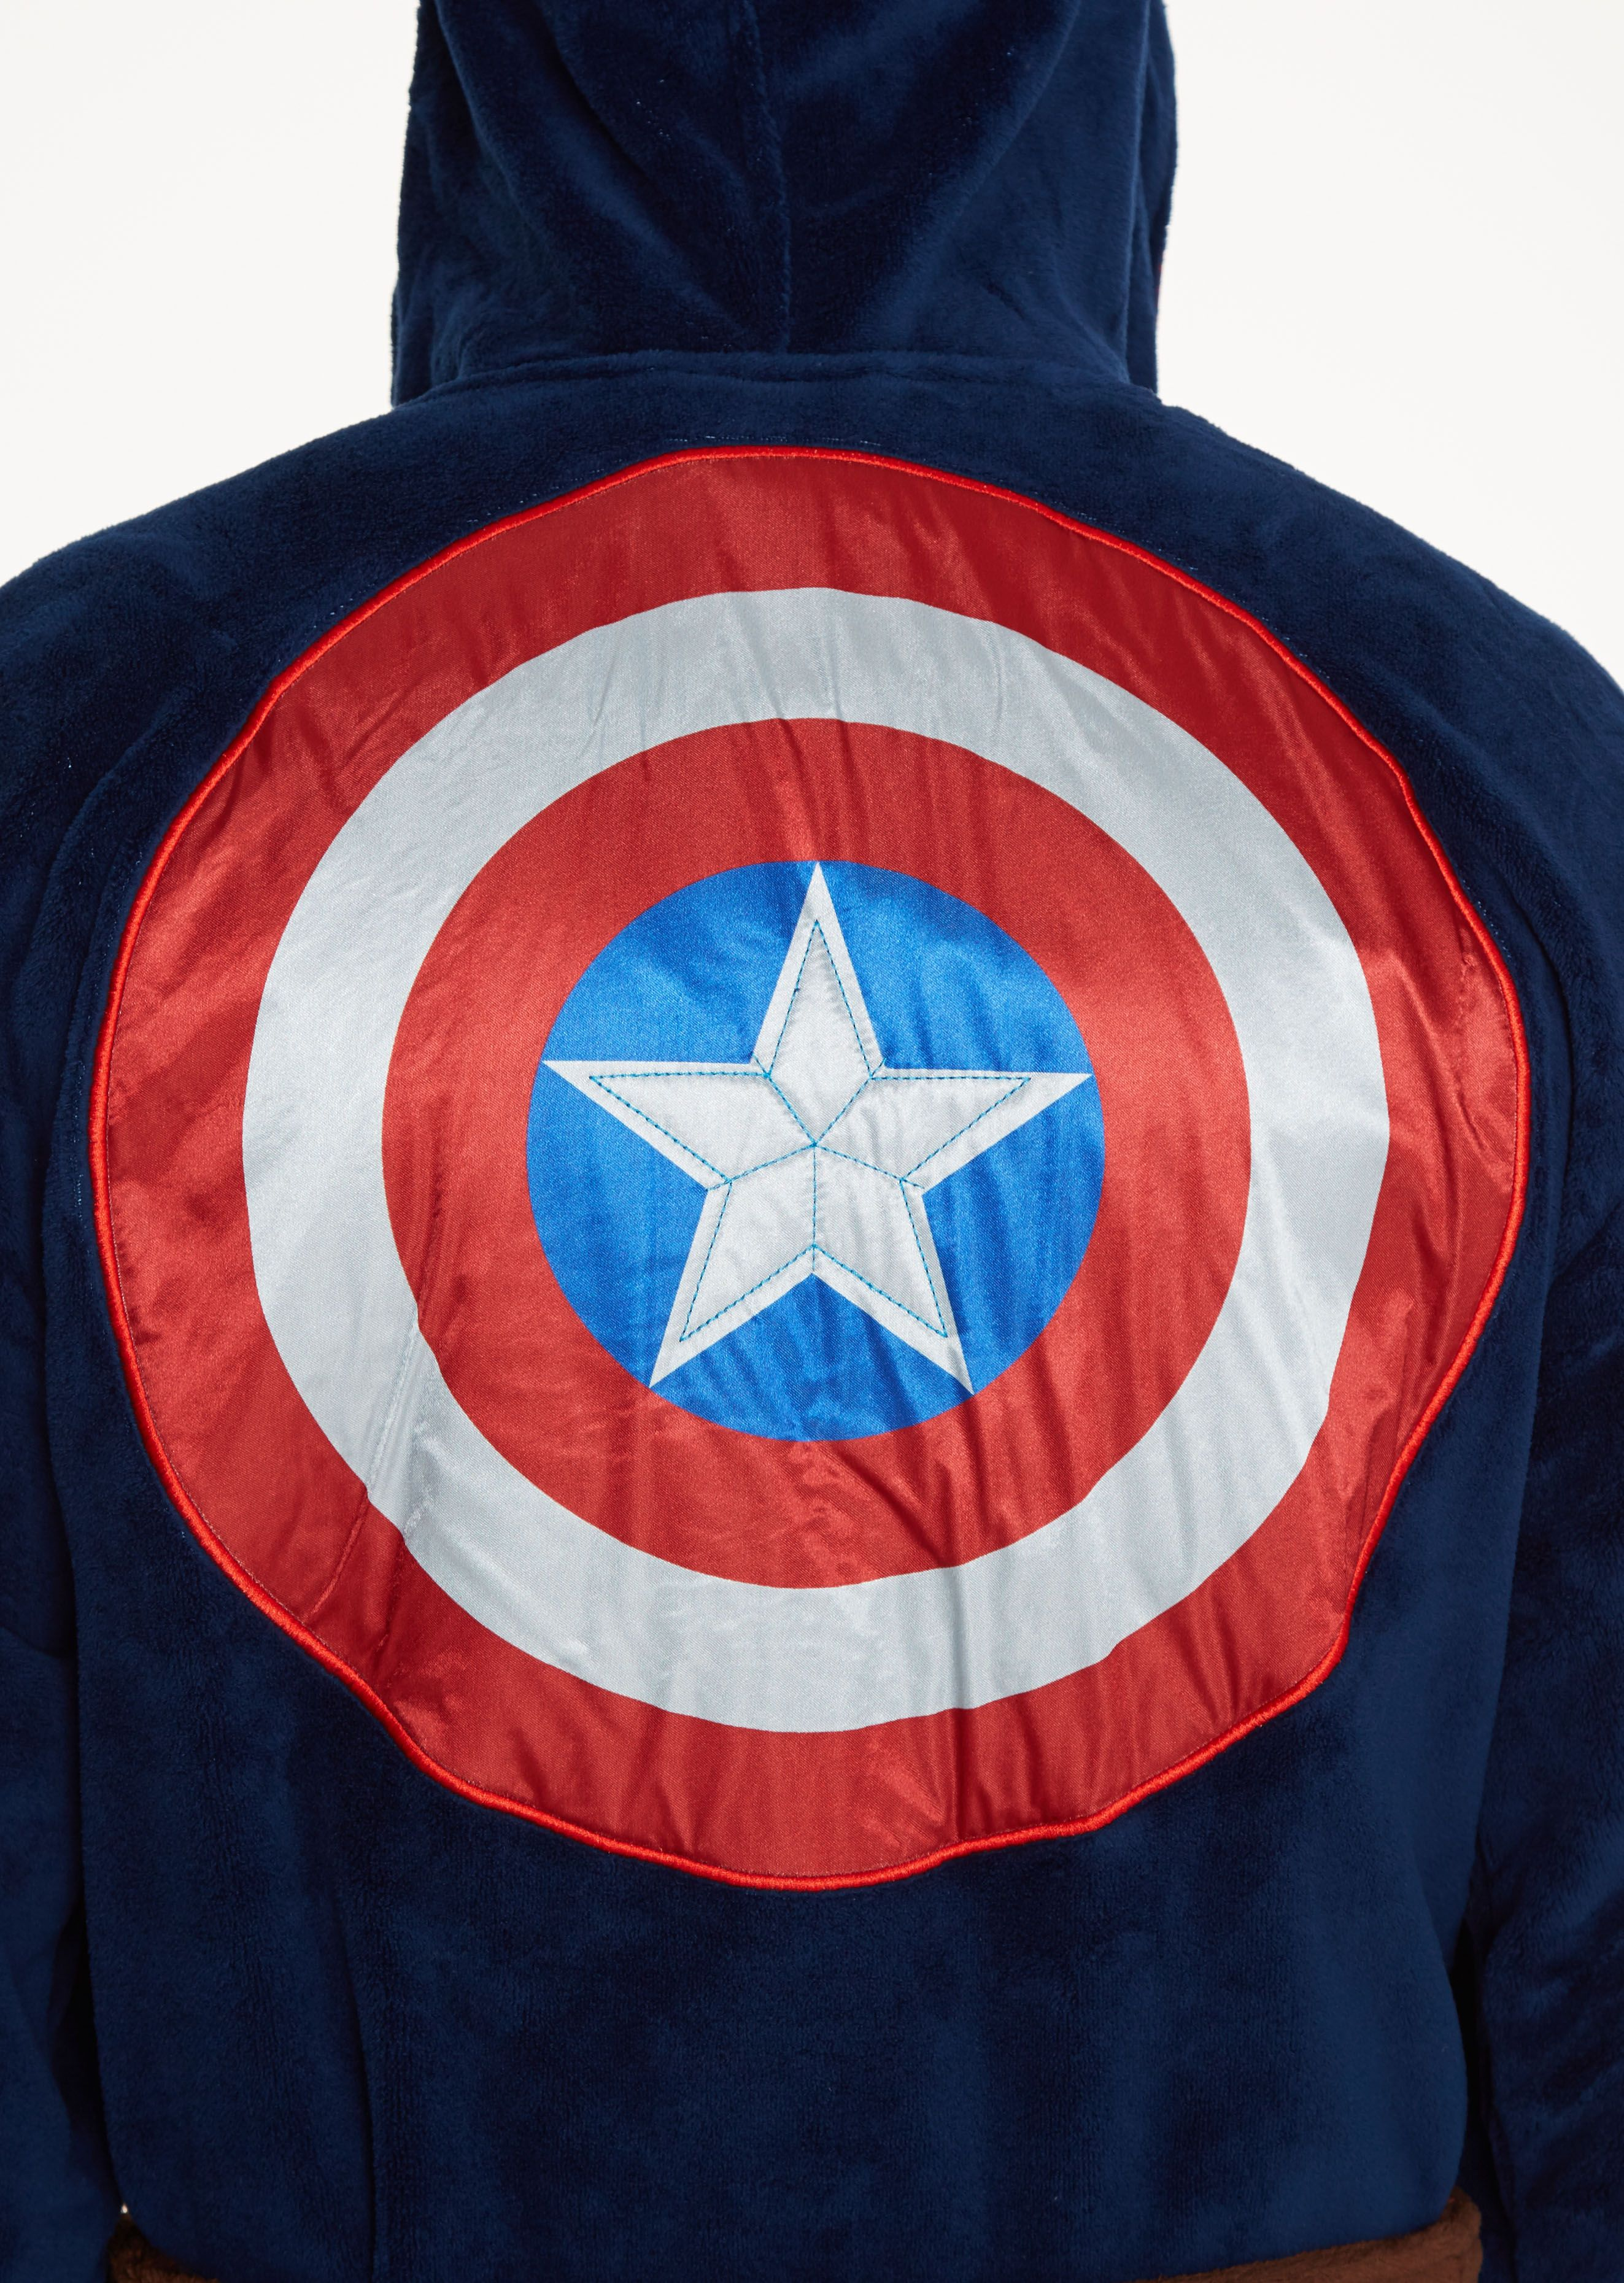 Marvel Captain America Civil War Outfit Bathrobe.  f13401c32